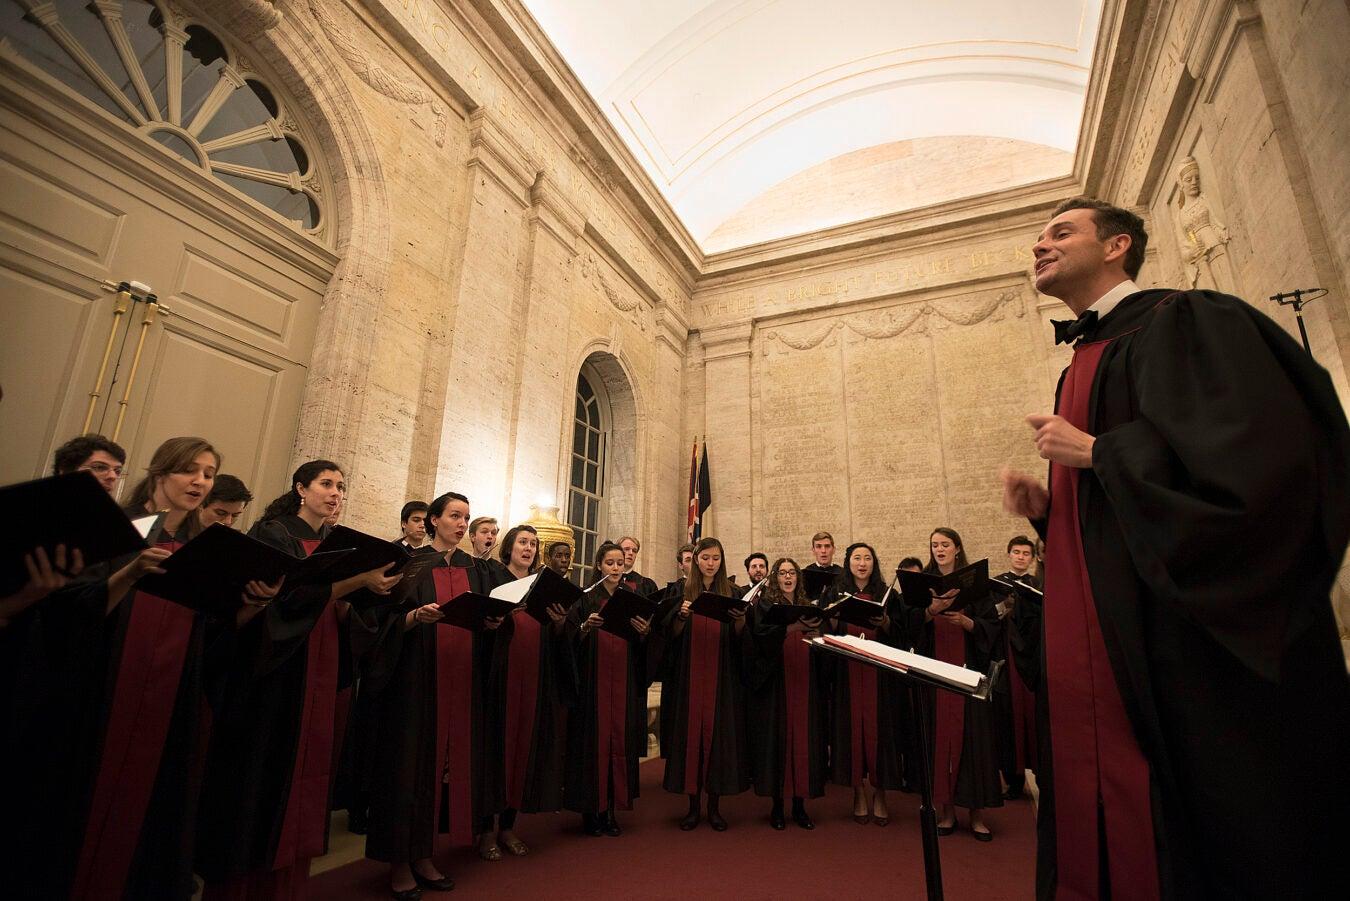 Choir singers ring conductor.